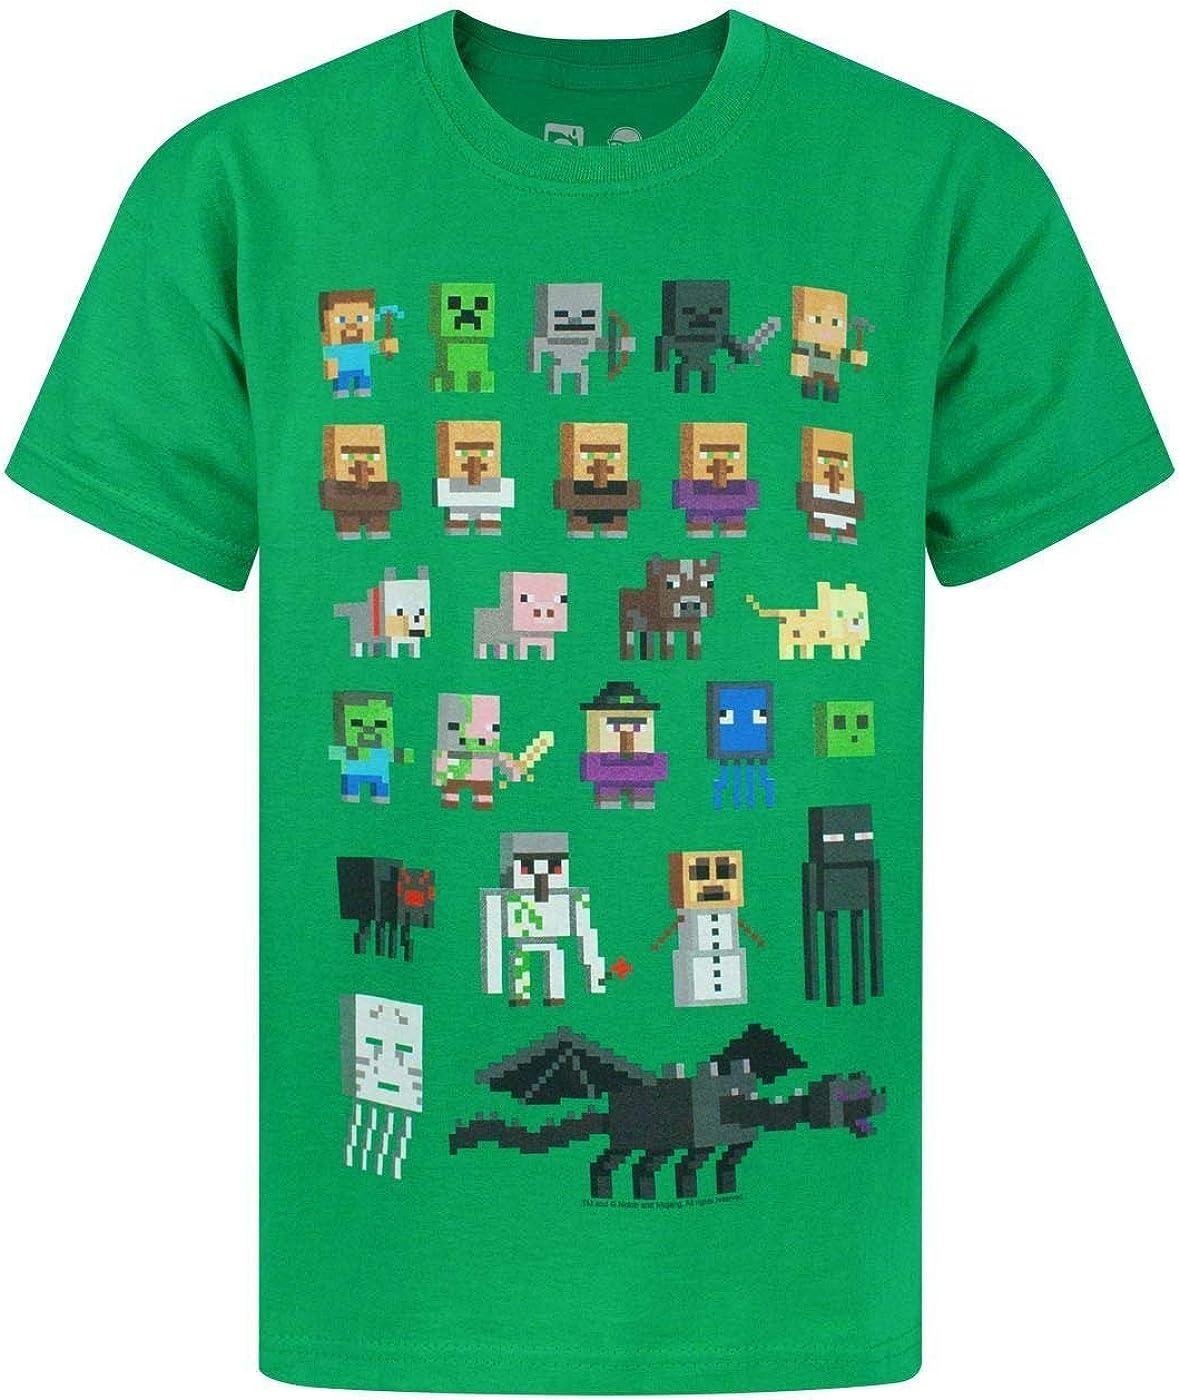 Minecraft T Shirt for Boys Sprites Short Sleeve Kids Top